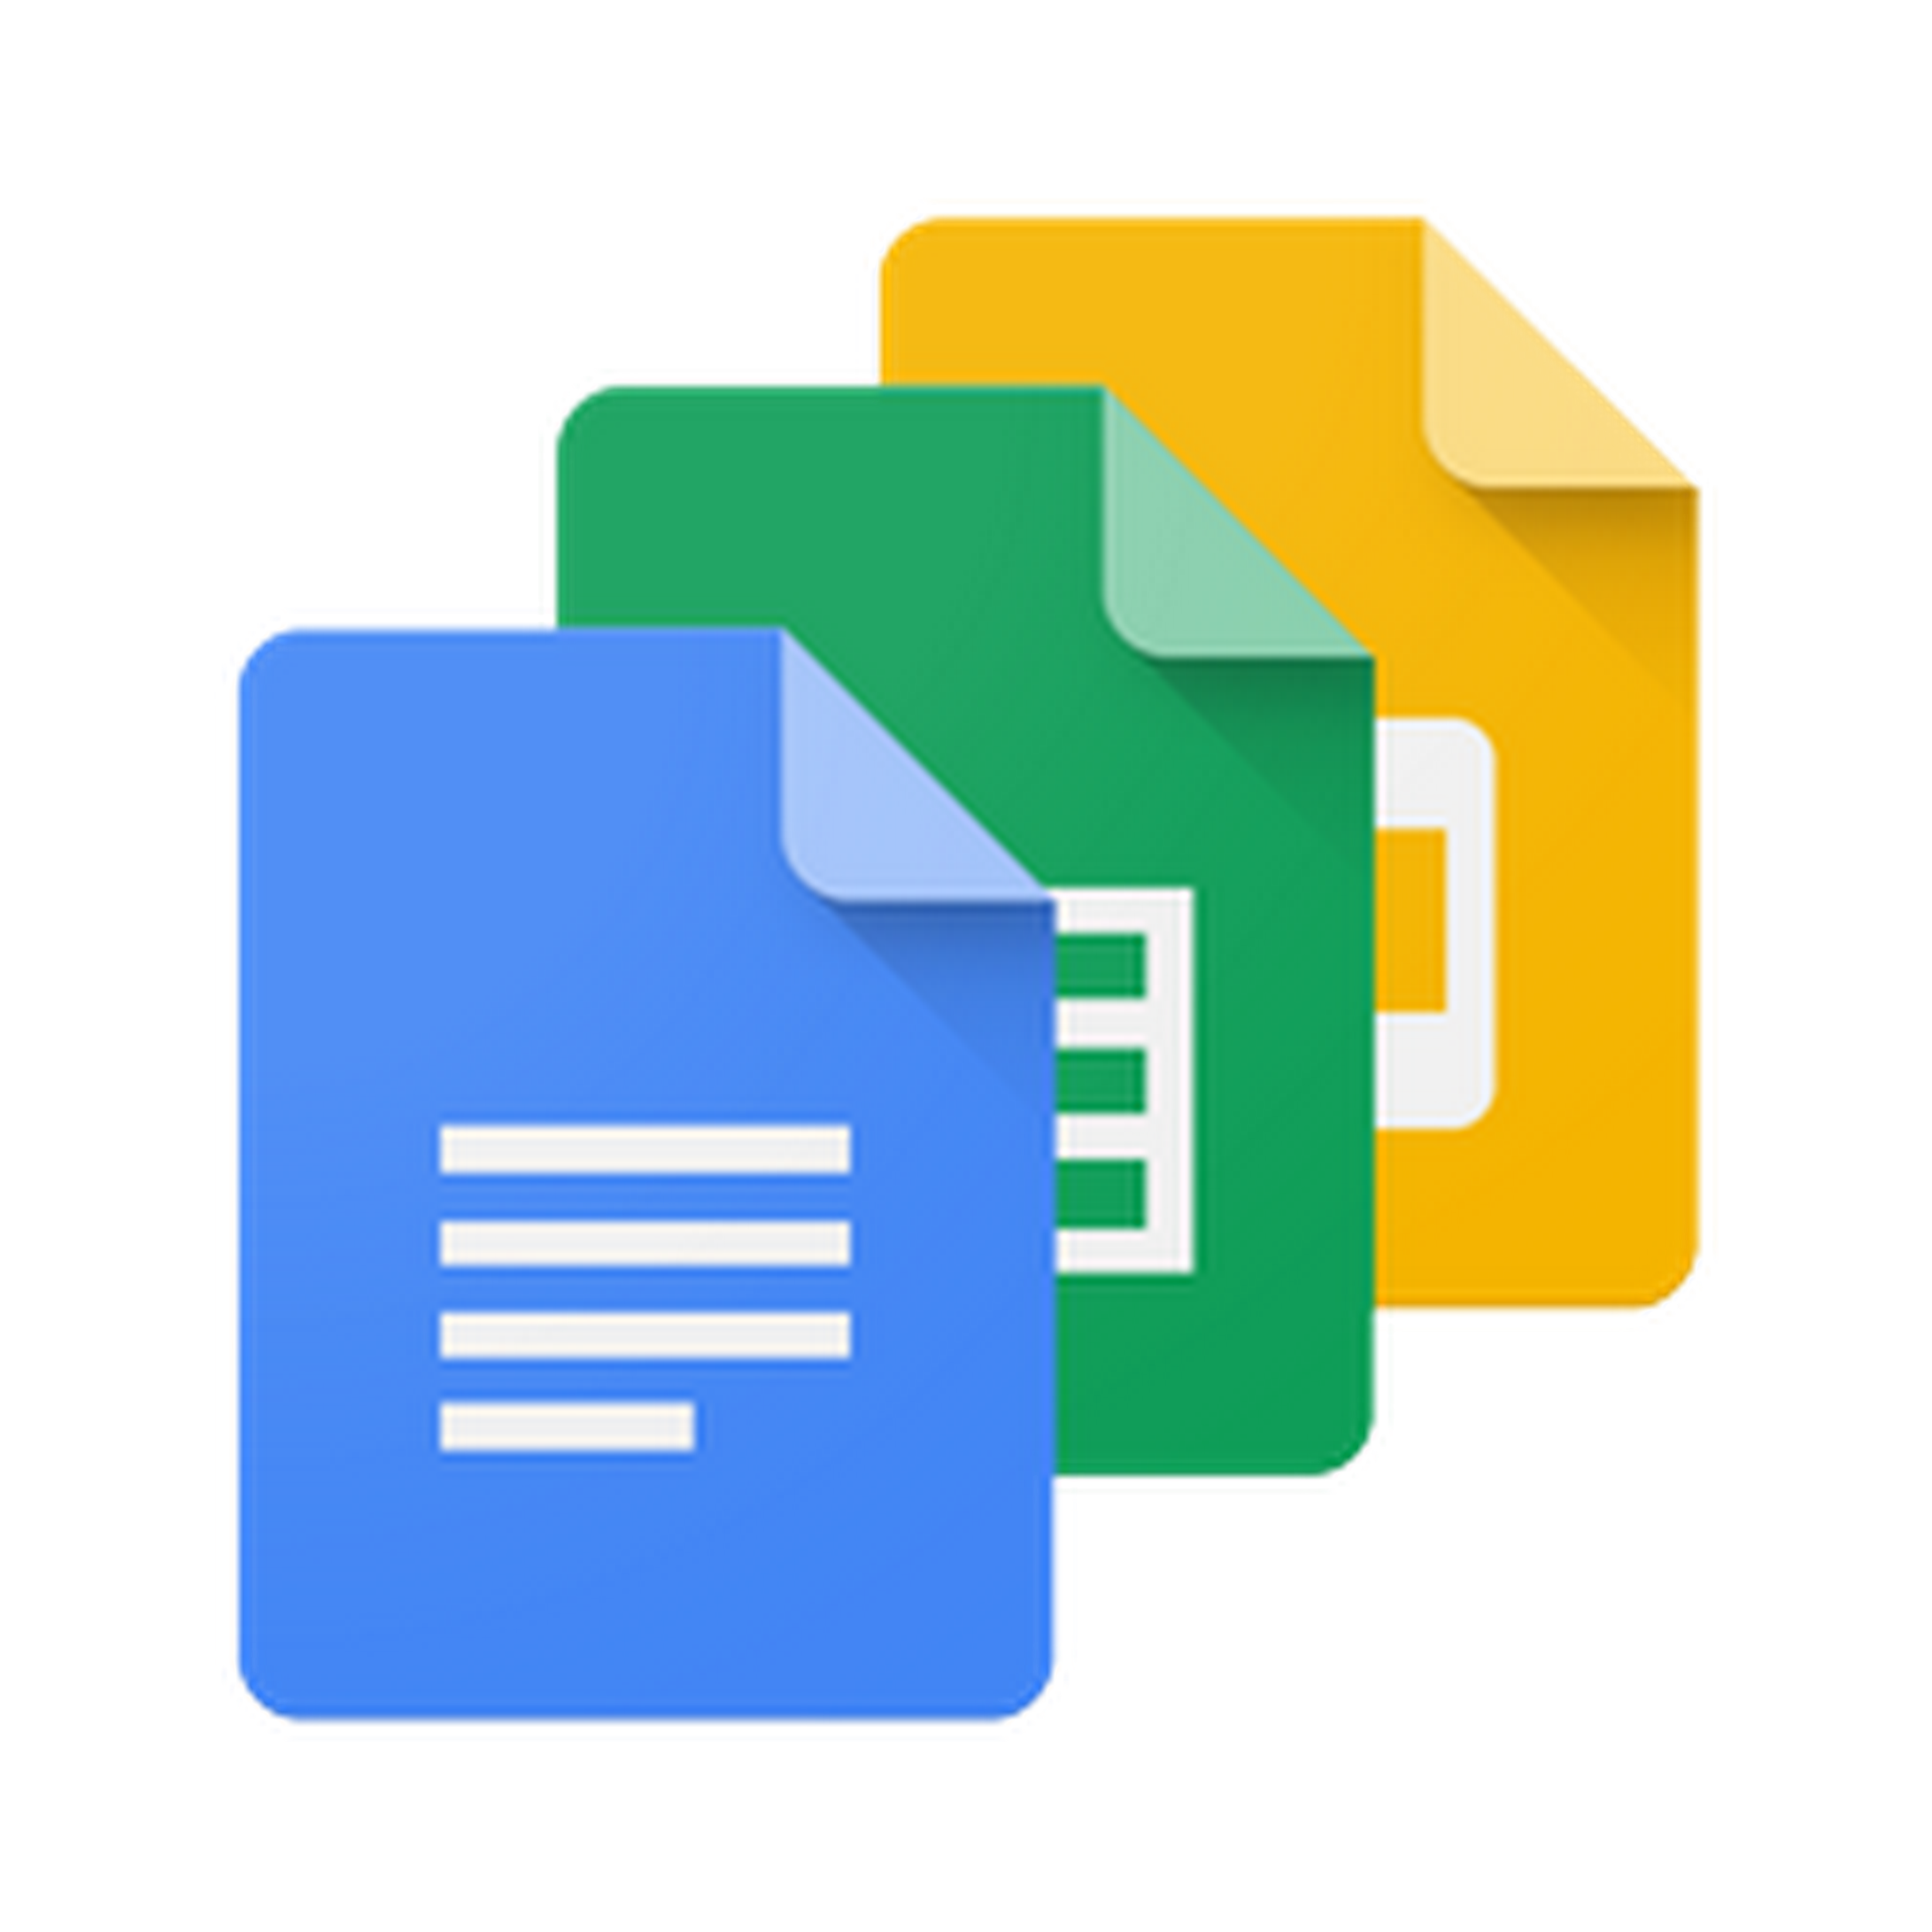 Google Docs Transparent 2800 x 2800.png